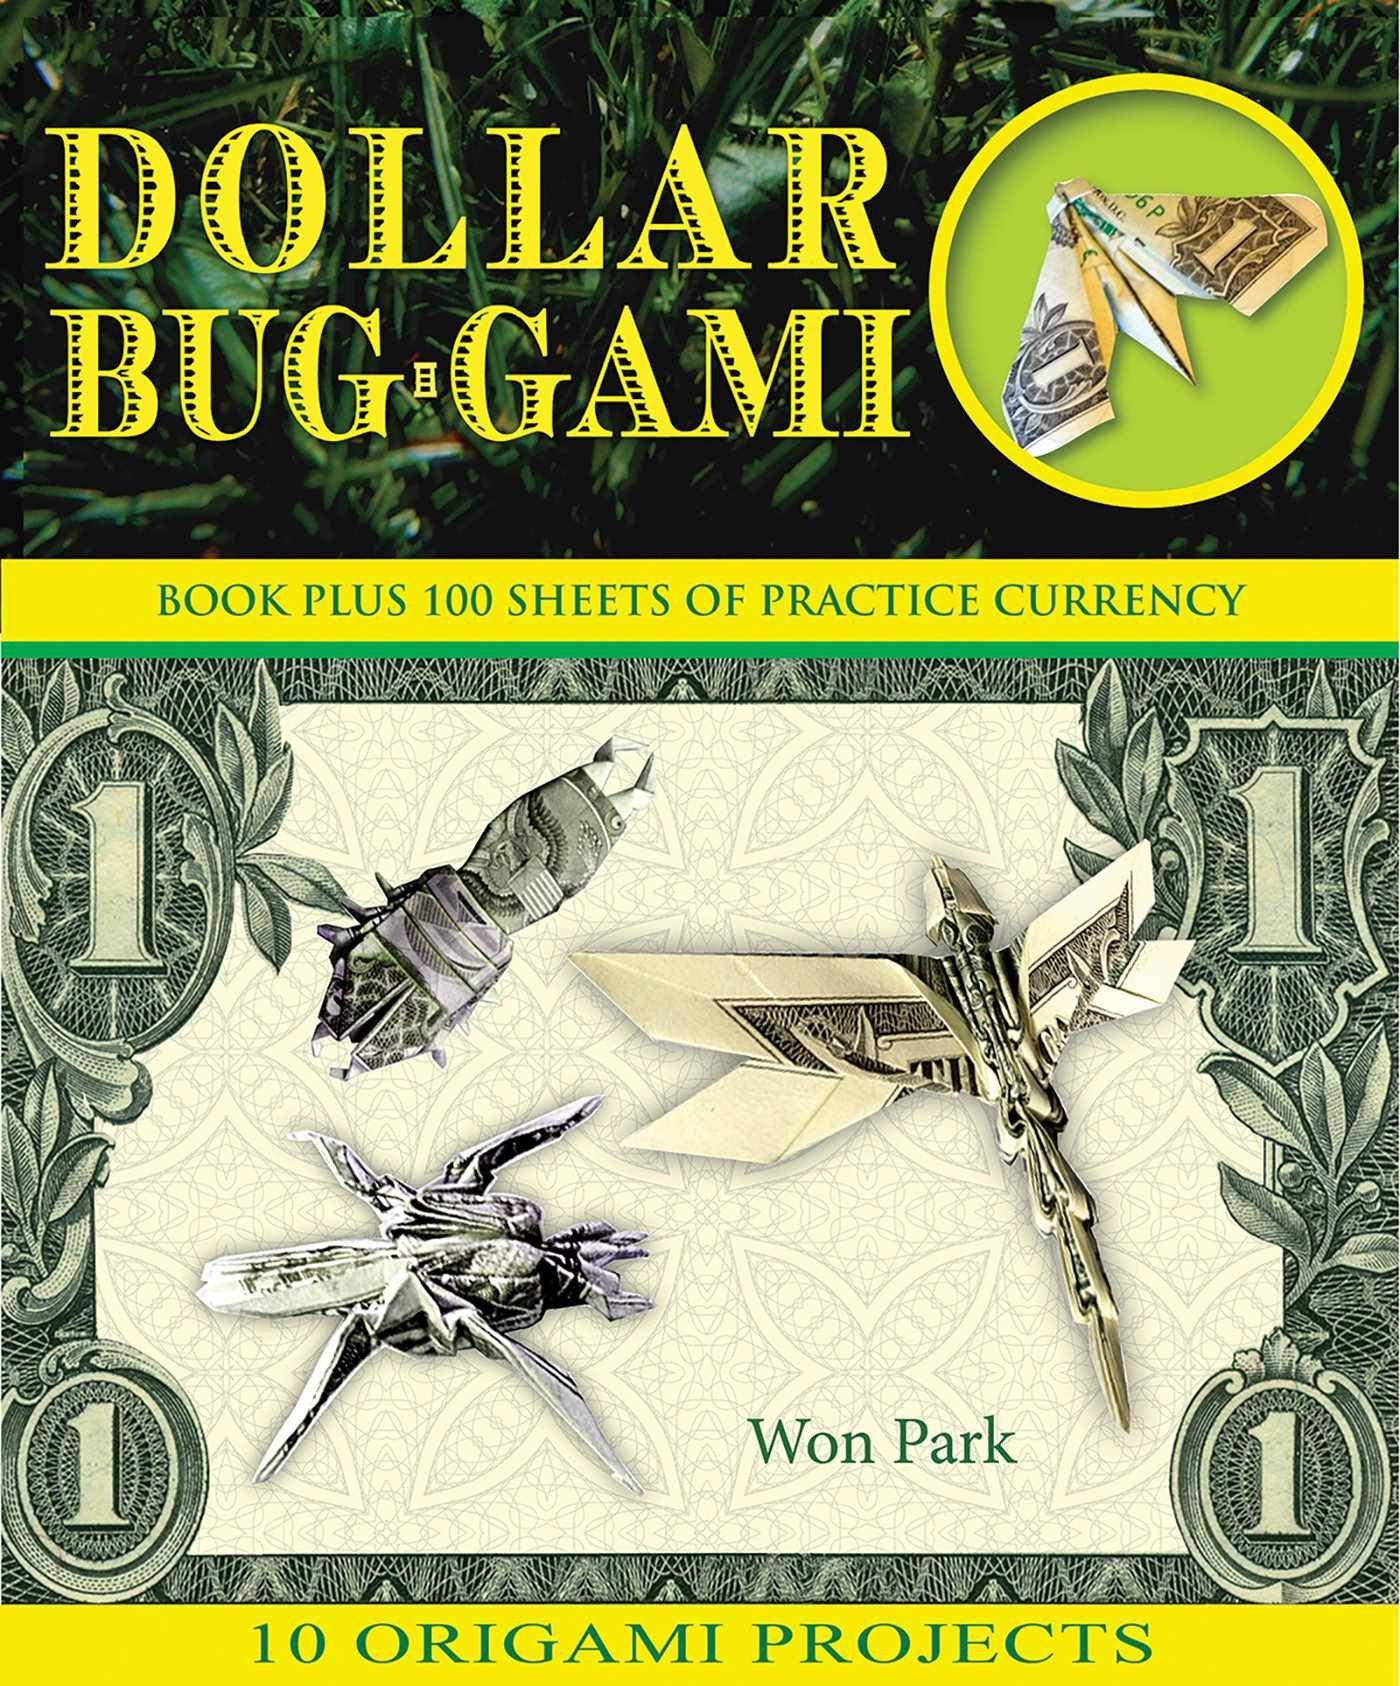 Amazing Origami Using Only Dollar Bills «TwistedSifter | 1686x1400